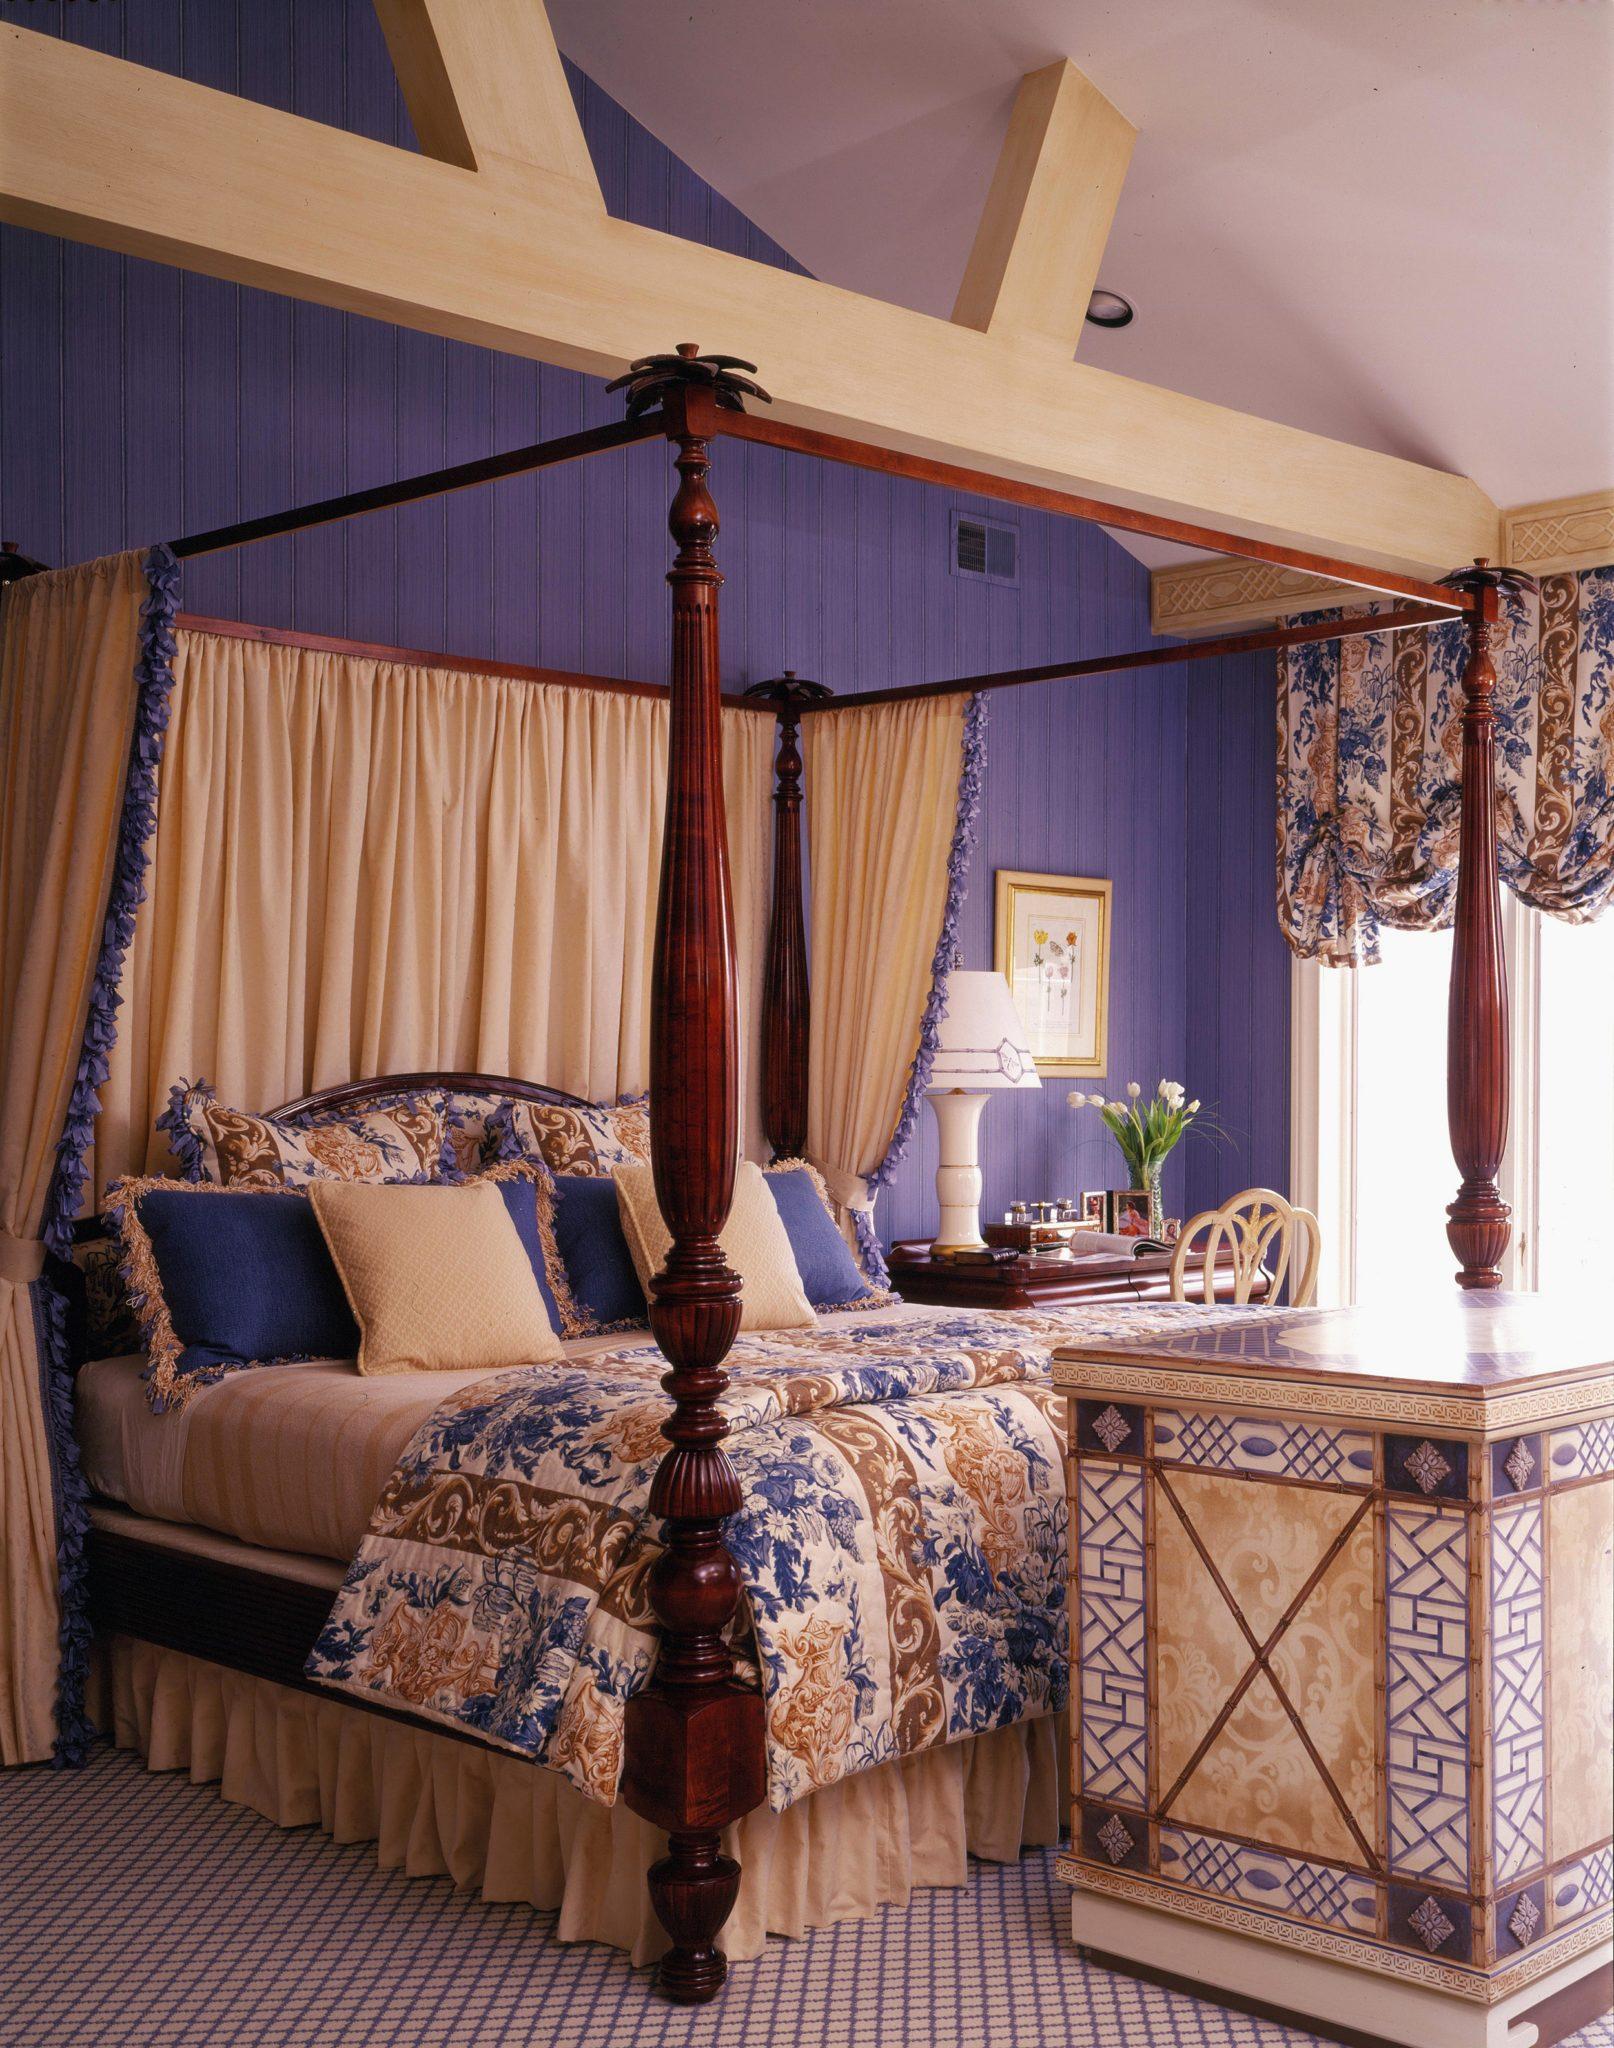 Interior design by SGH Designs Inc.